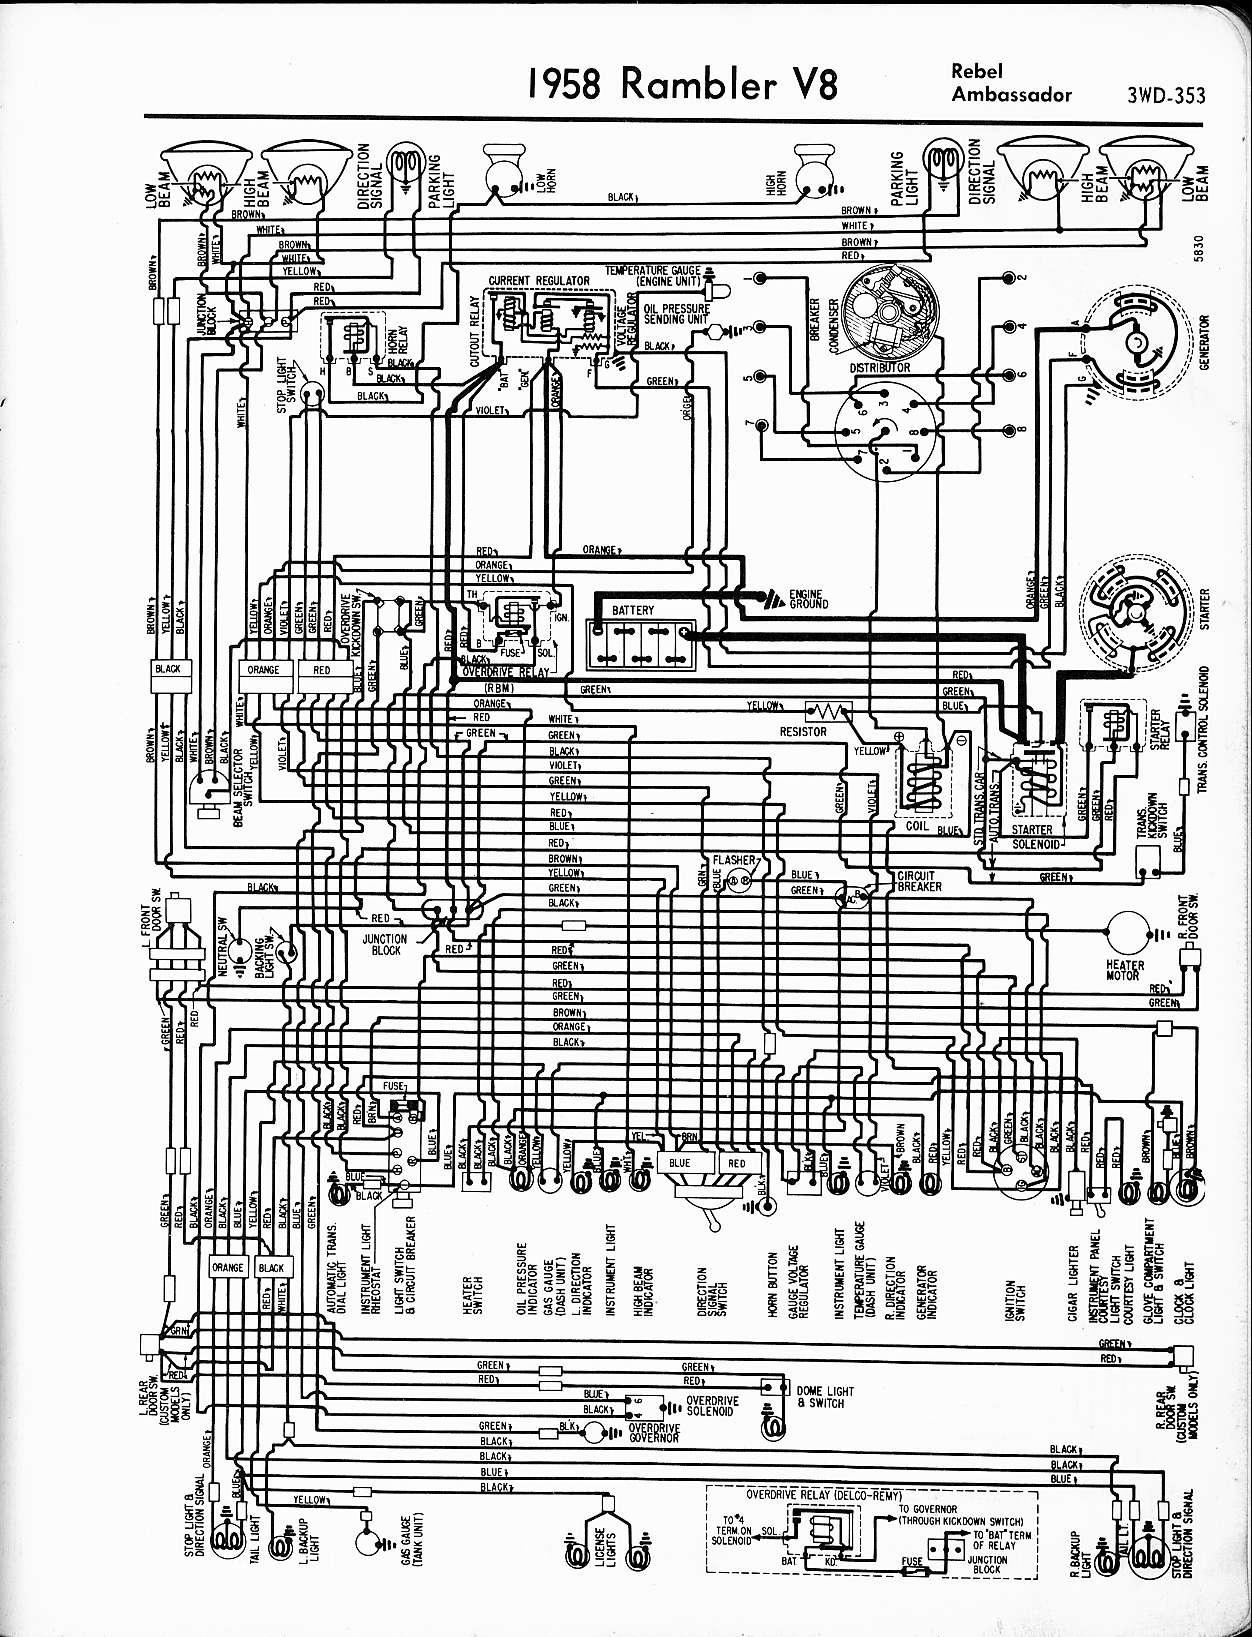 rambler wiring diagrams the old car manual project1958 rambler v8 rebel, ambassador